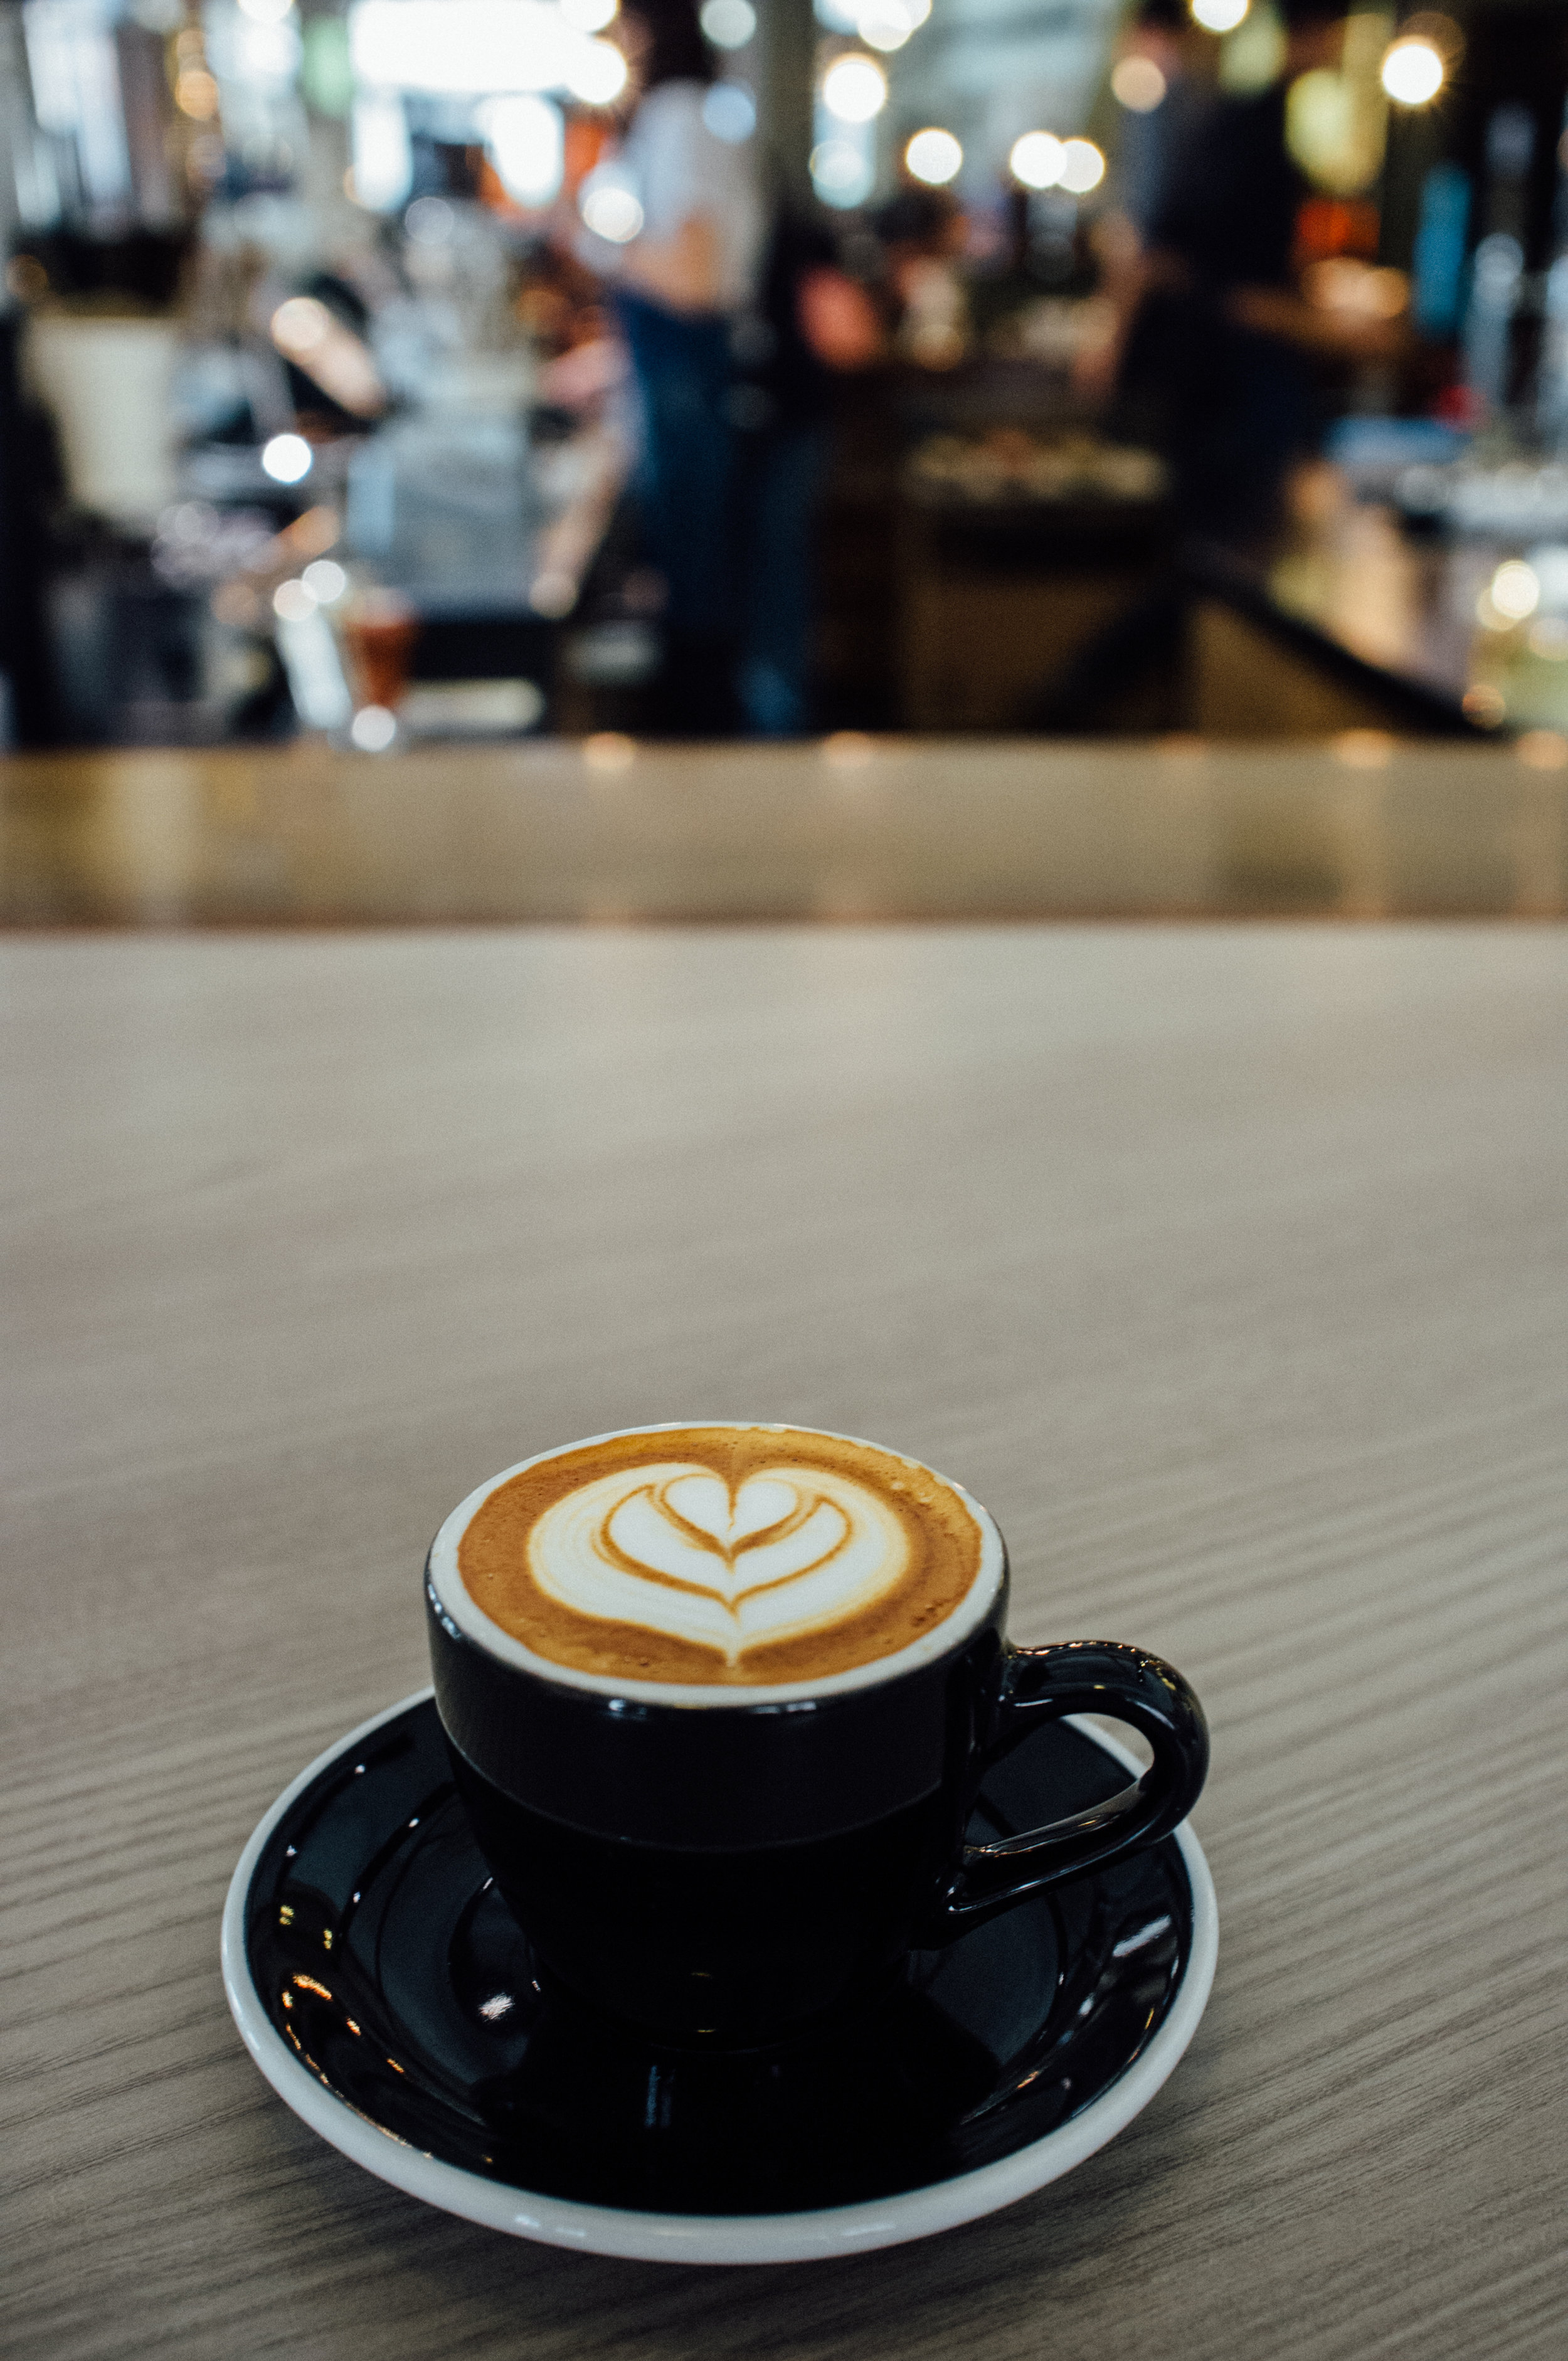 Cappuccino at Chye Seng Huat Hardware Coffee Bar